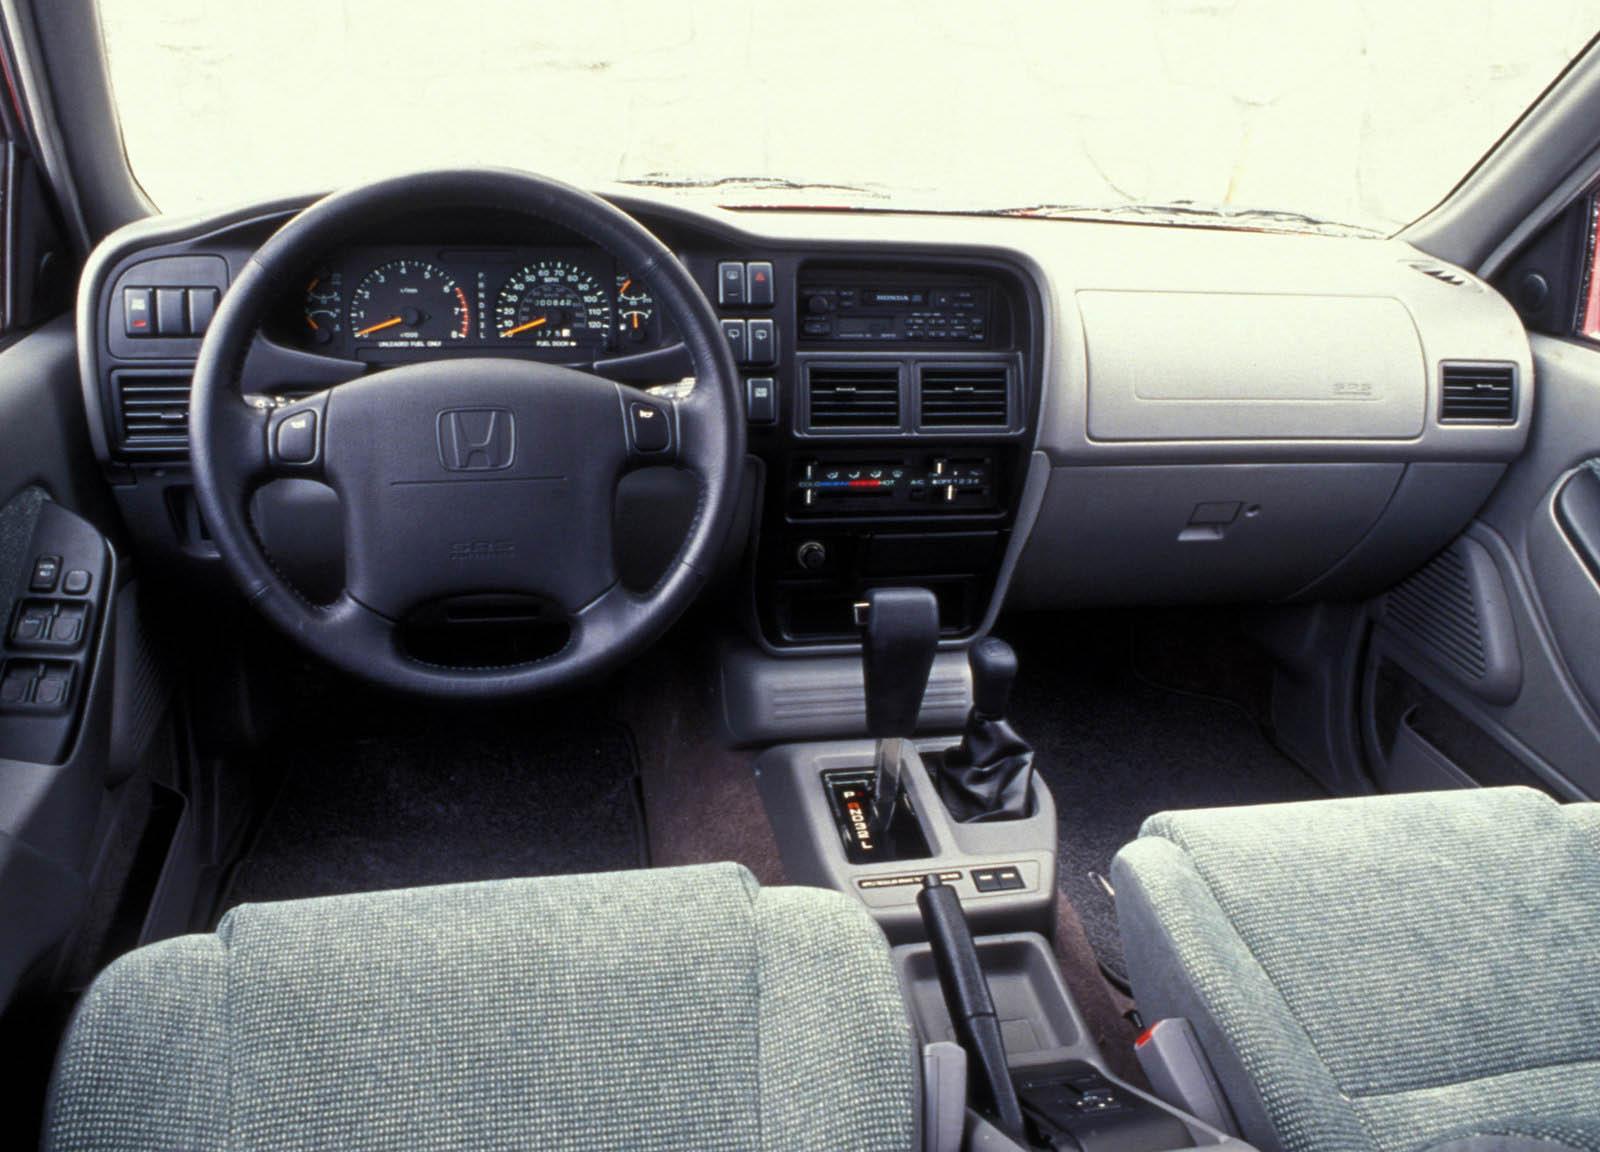 Honda Preparing To Bring Back The Passport? | Carscoops